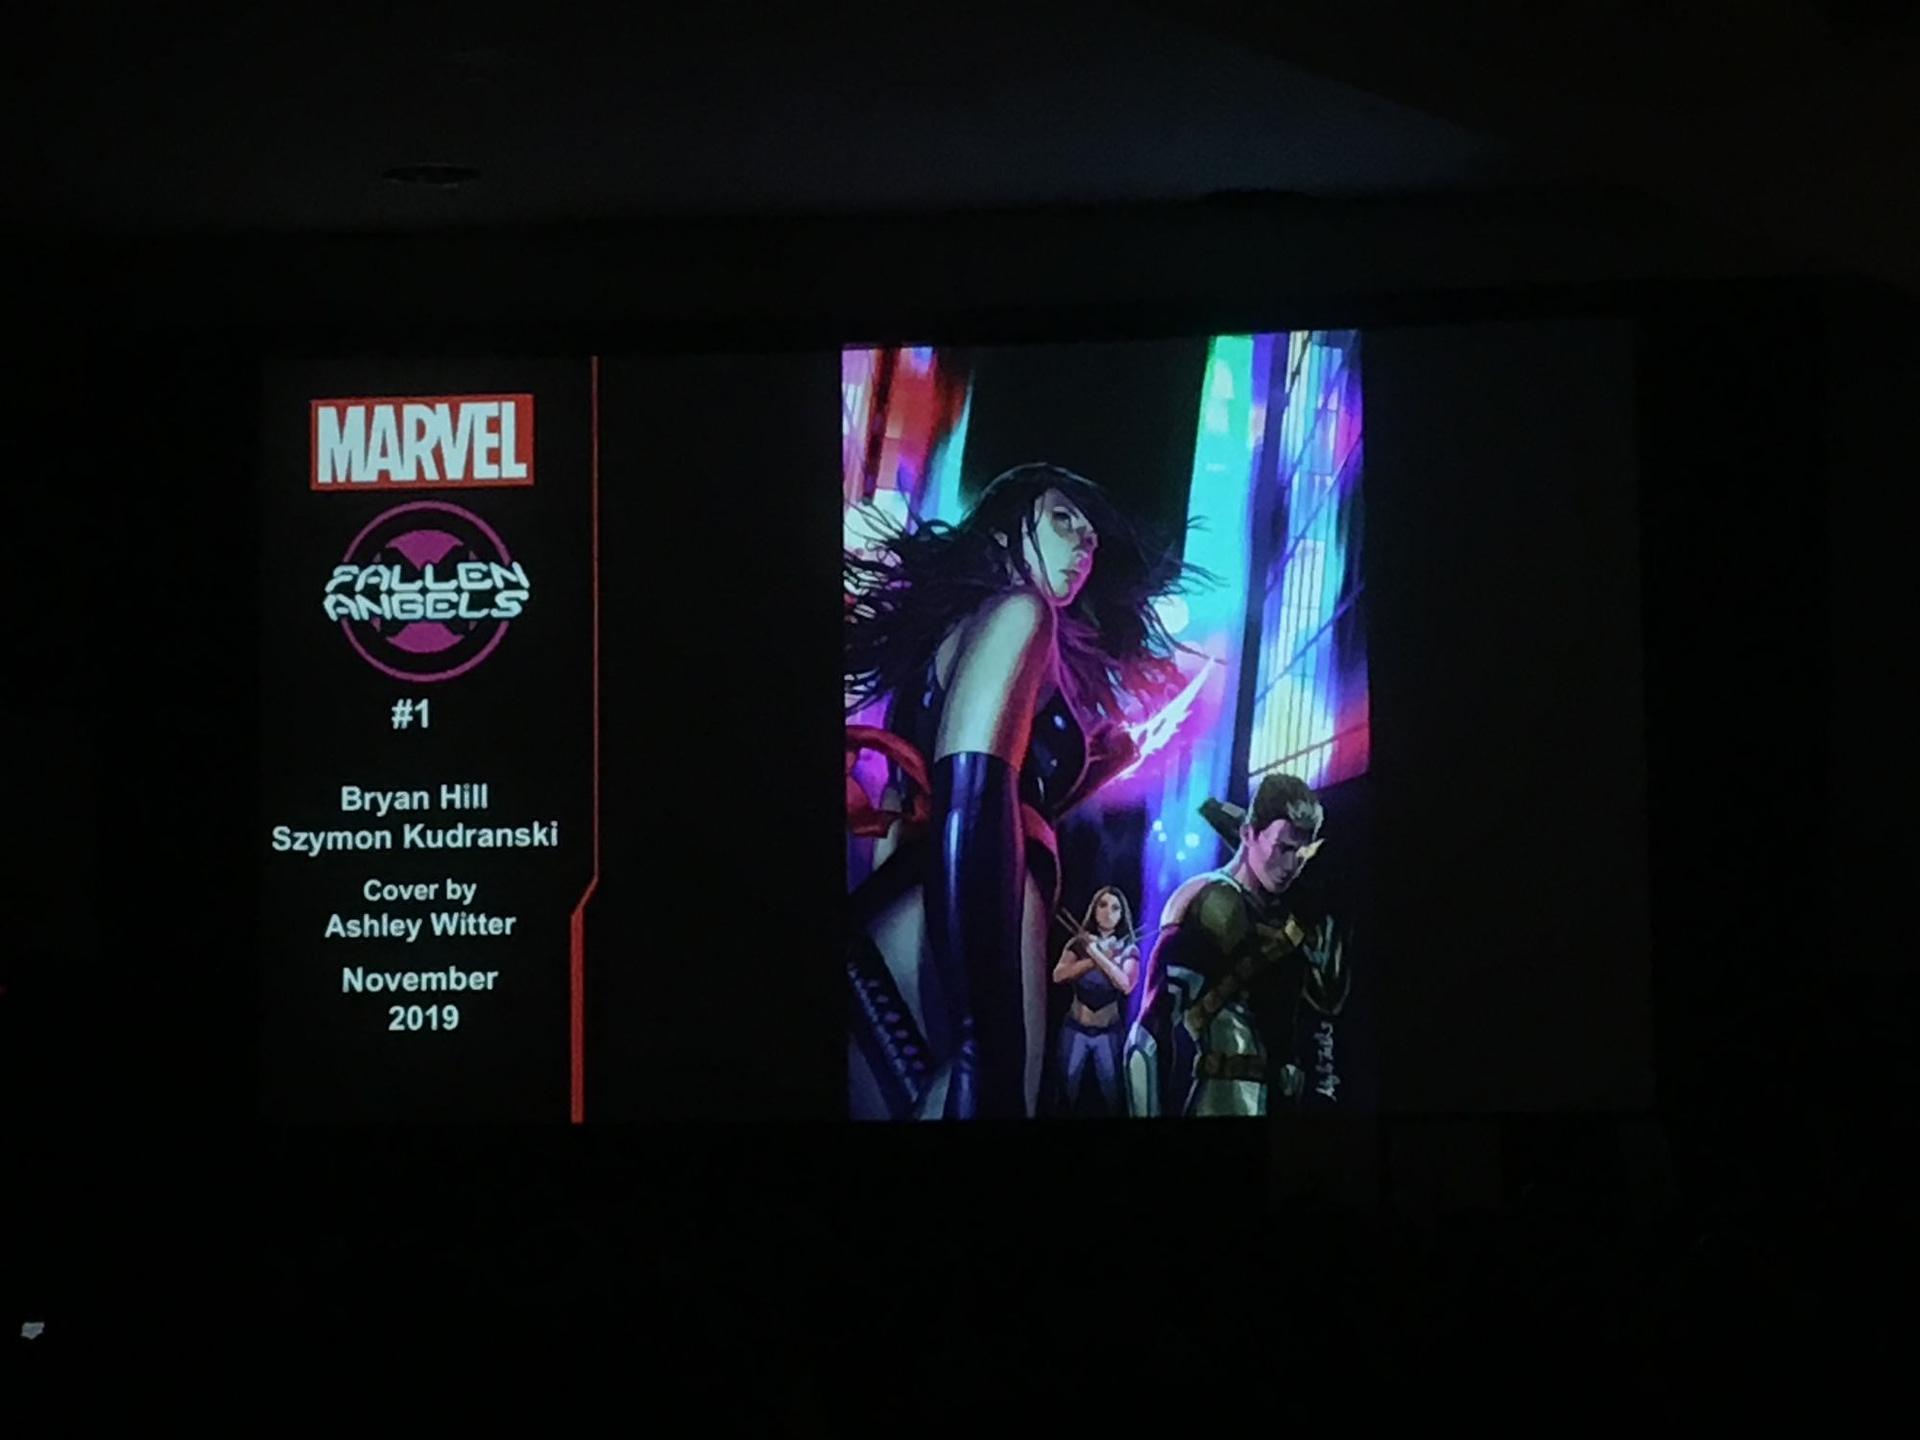 NYCC '19: Marvel's X-Men - Dawn of X Panel